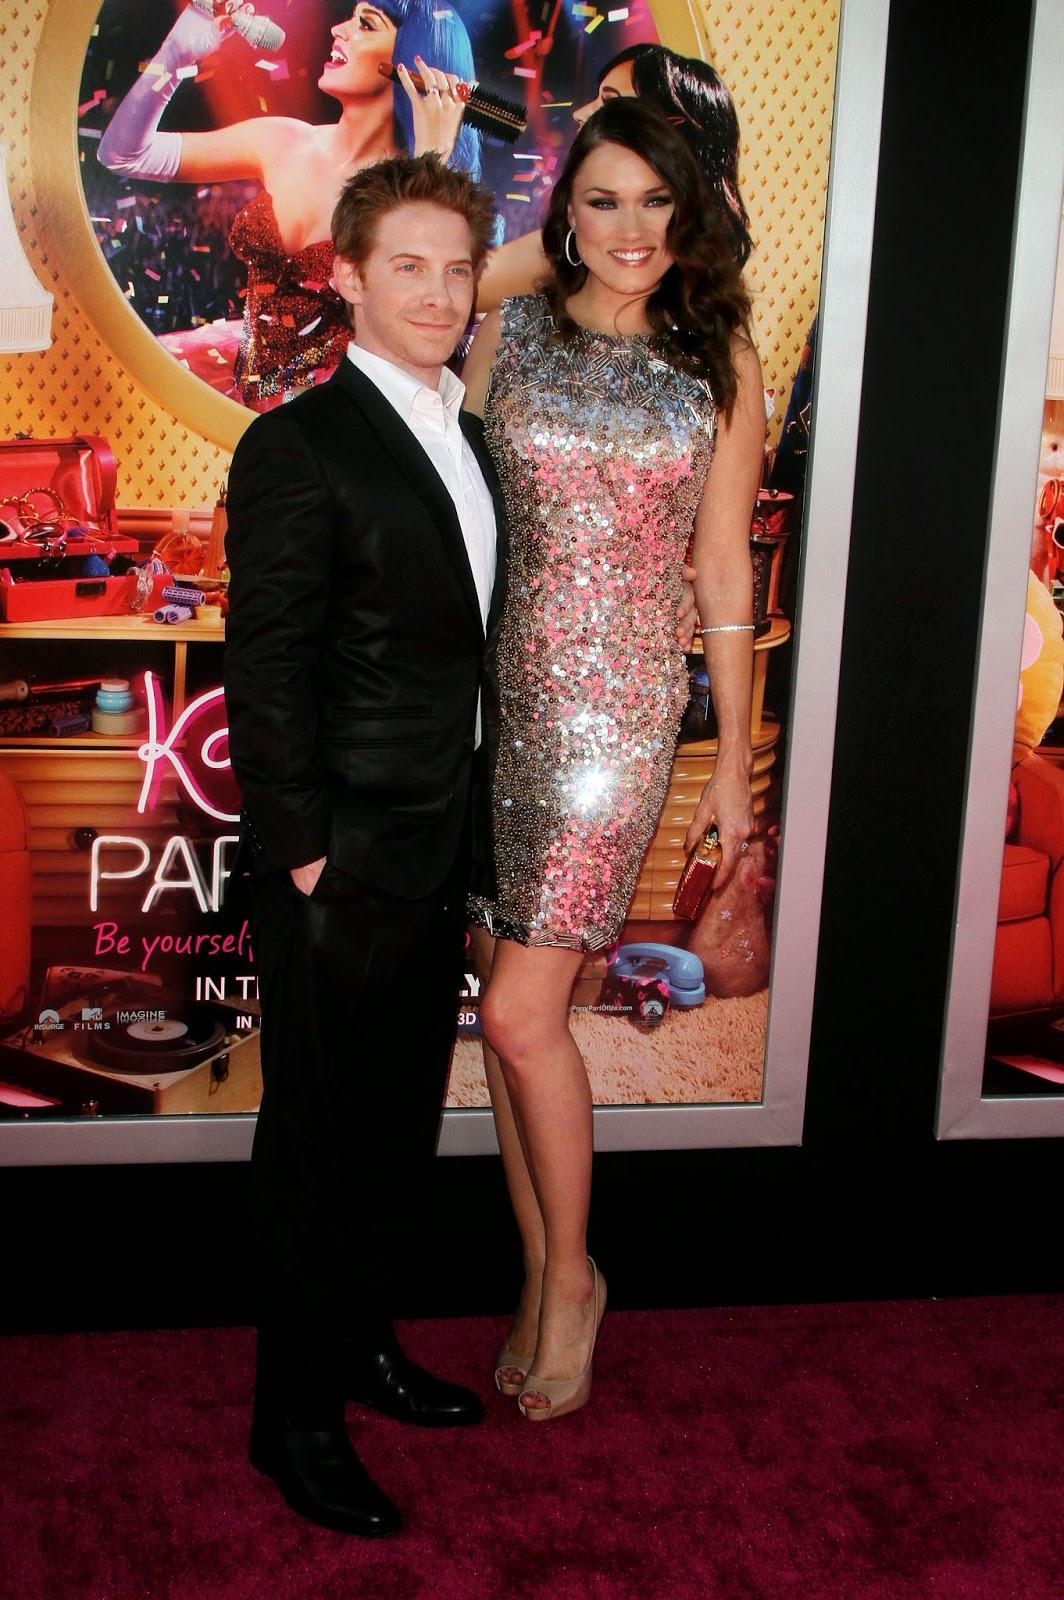 Short Celebrities: Seth Green height: 5ft 3in (160 cm)